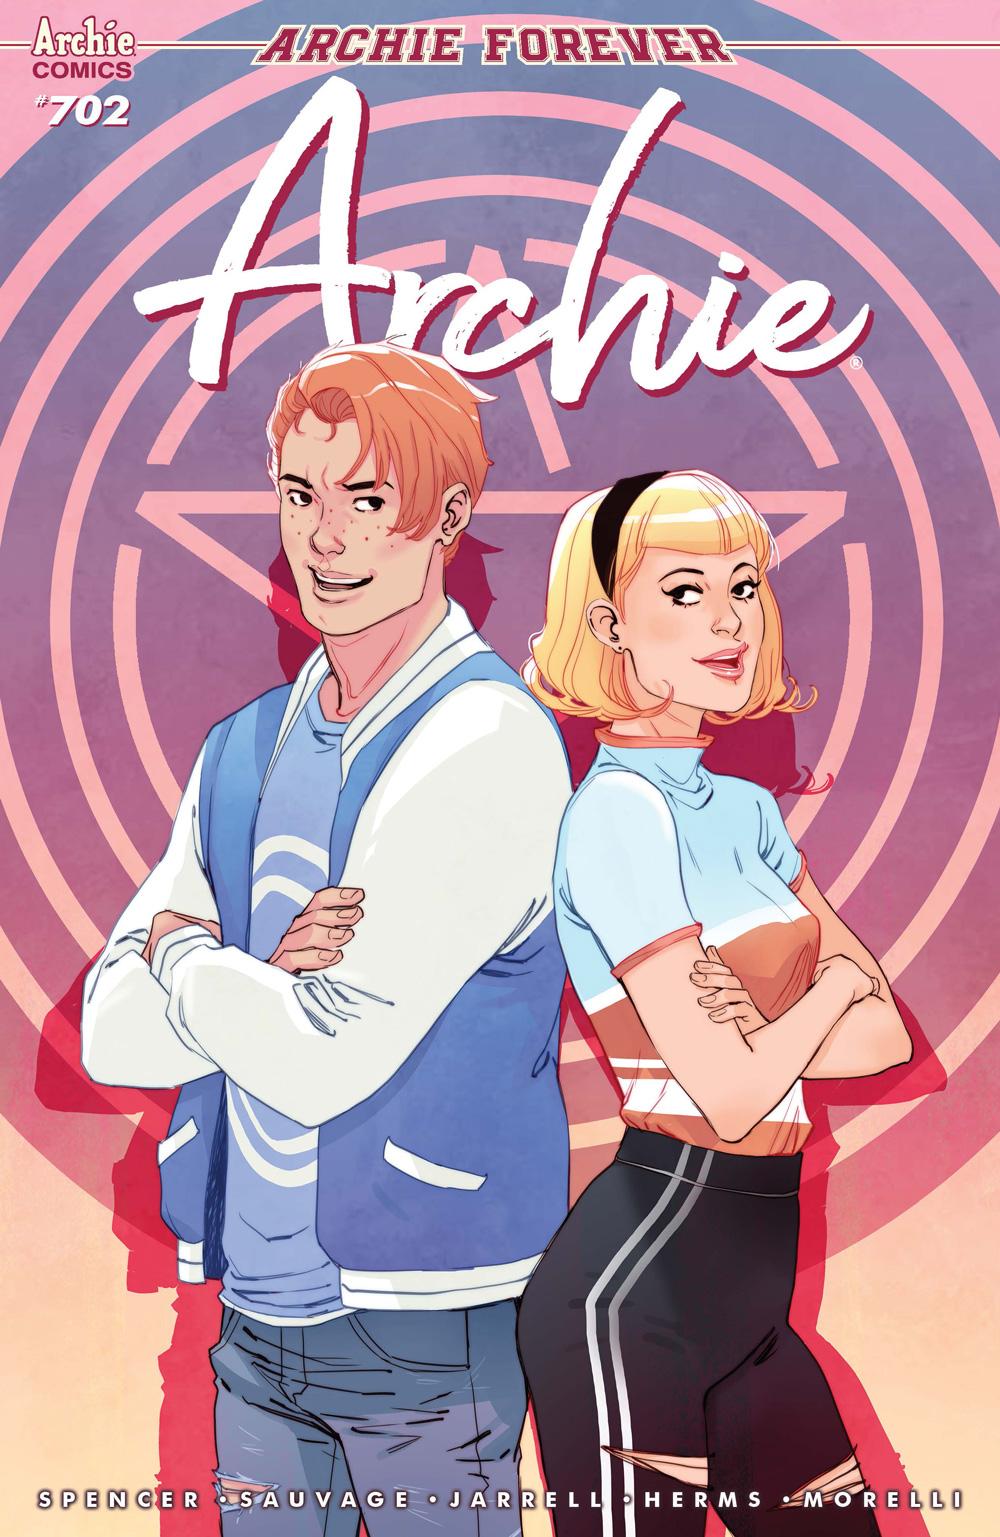 Archie 702